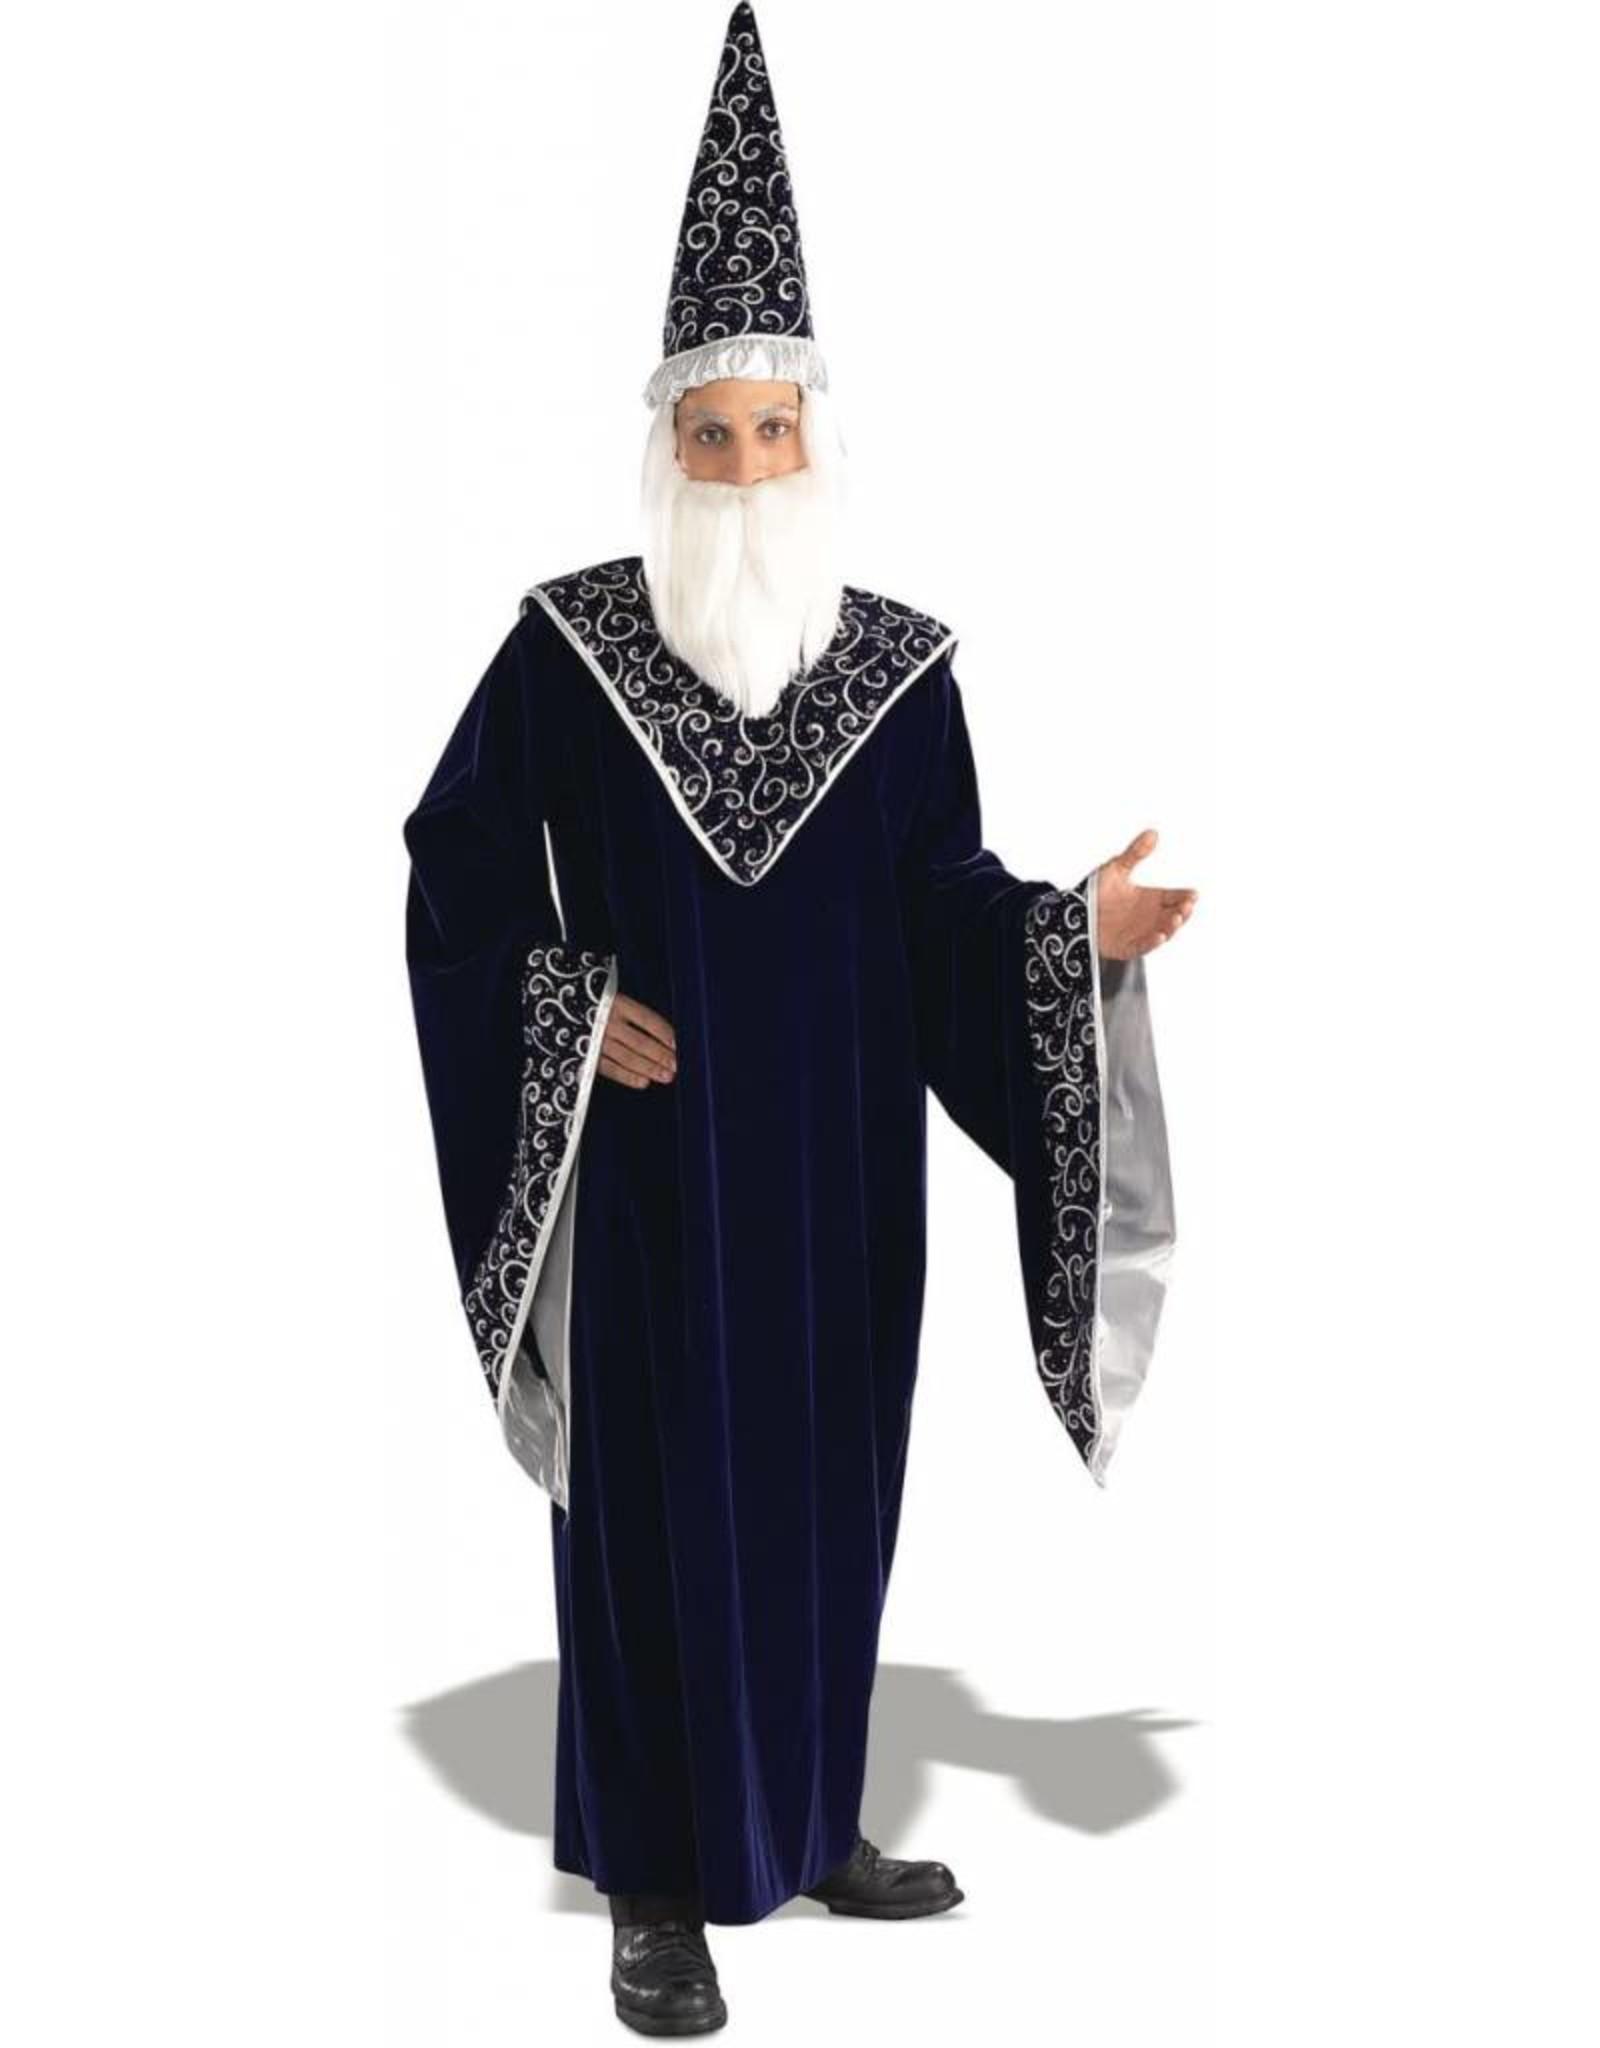 Rubies Costume Merlin the Magician